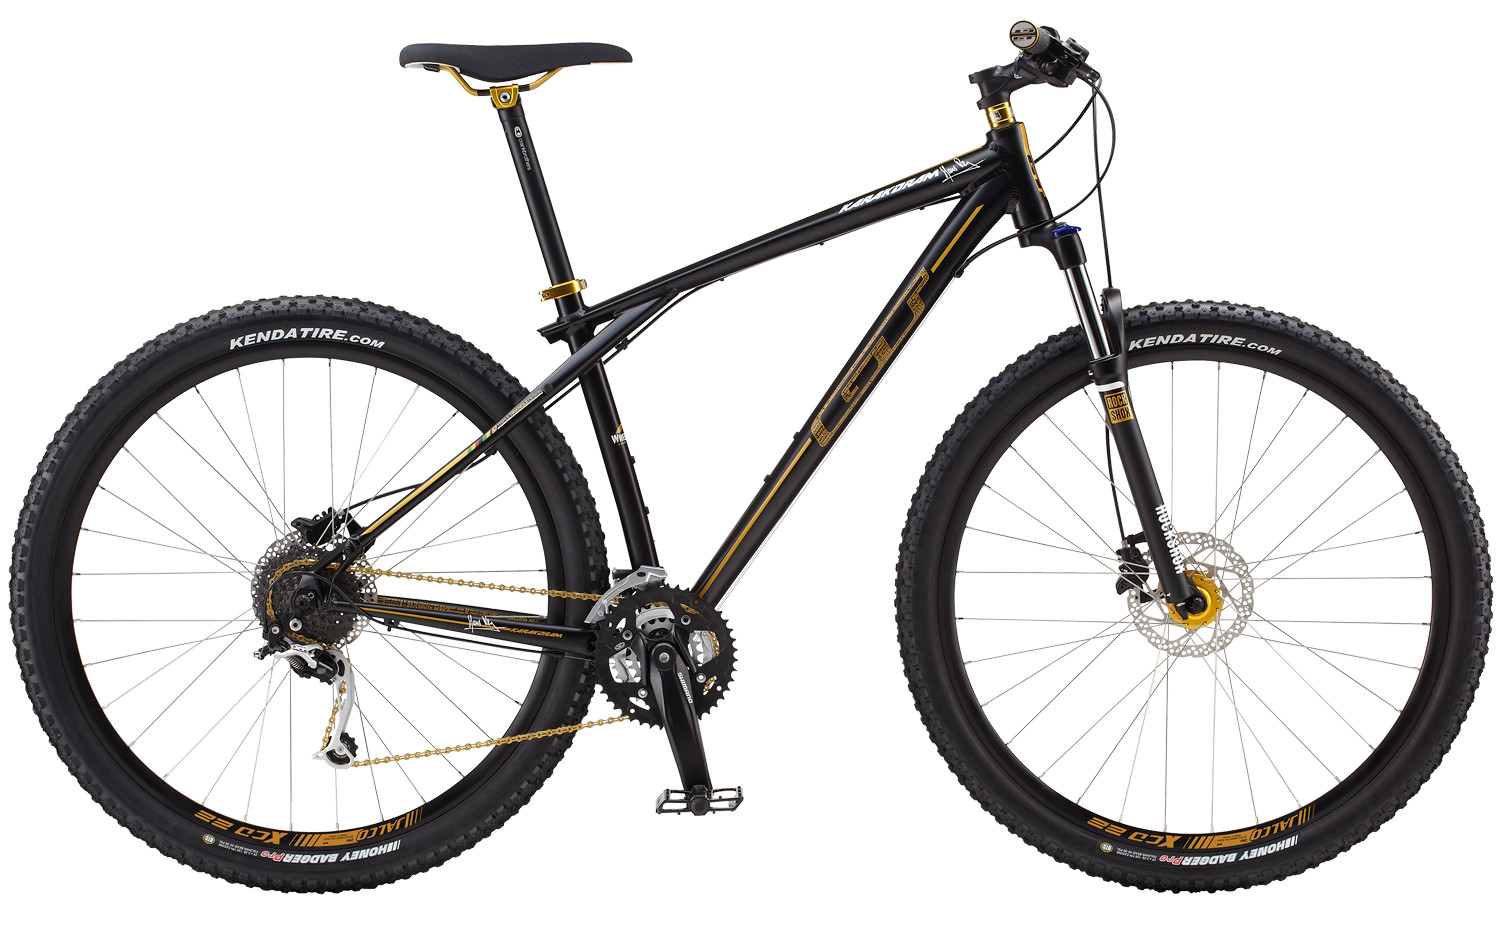 2014 Gt Karakoram Hans Rey Bike Reviews Comparisons